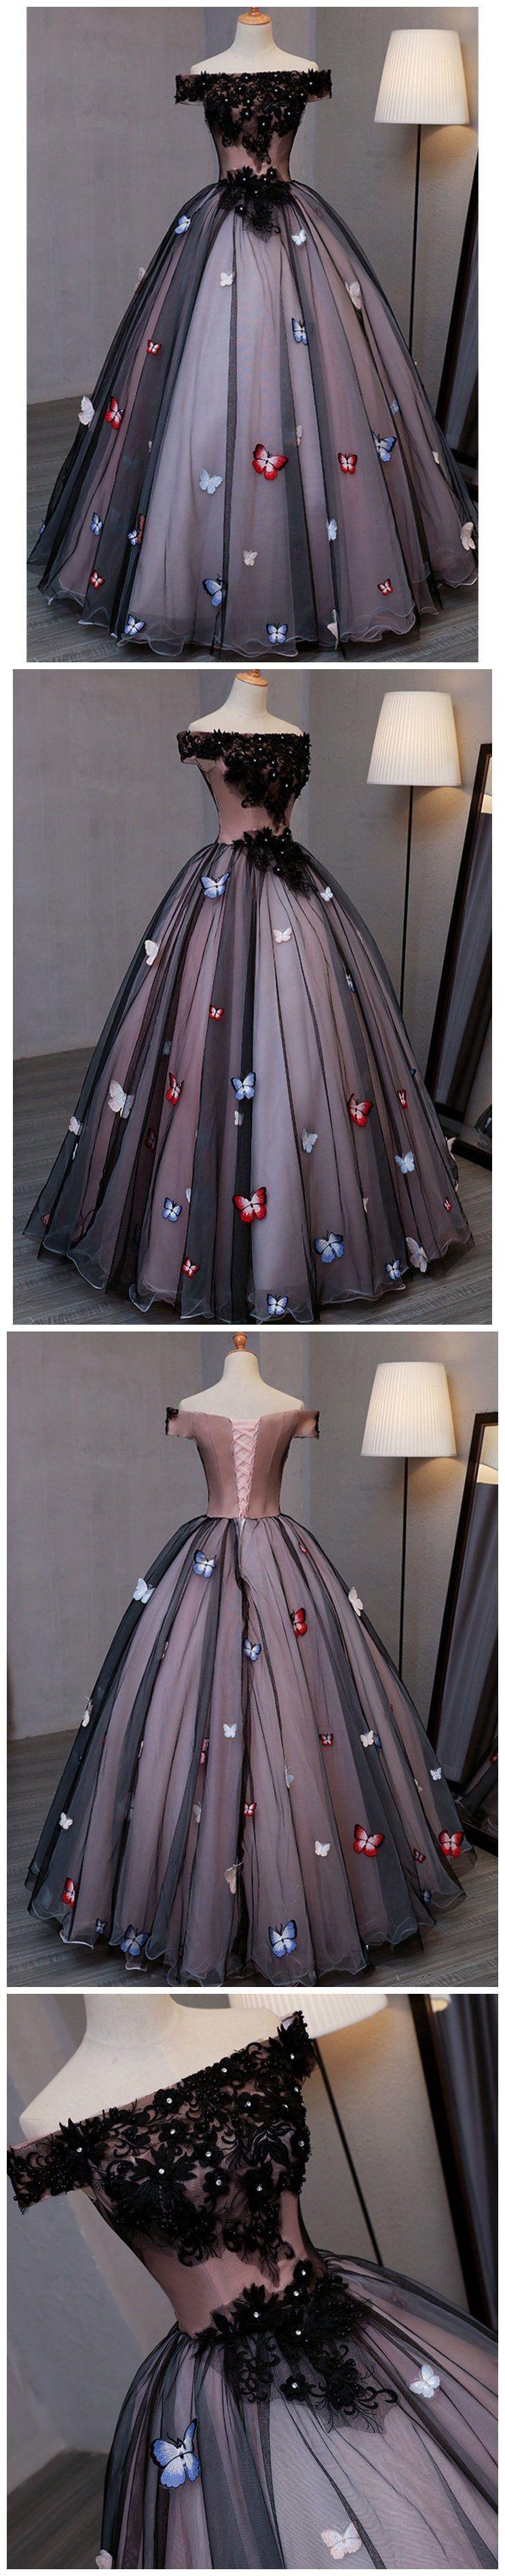 Off the shoulder black prom dresses plus size butterfly appliqued